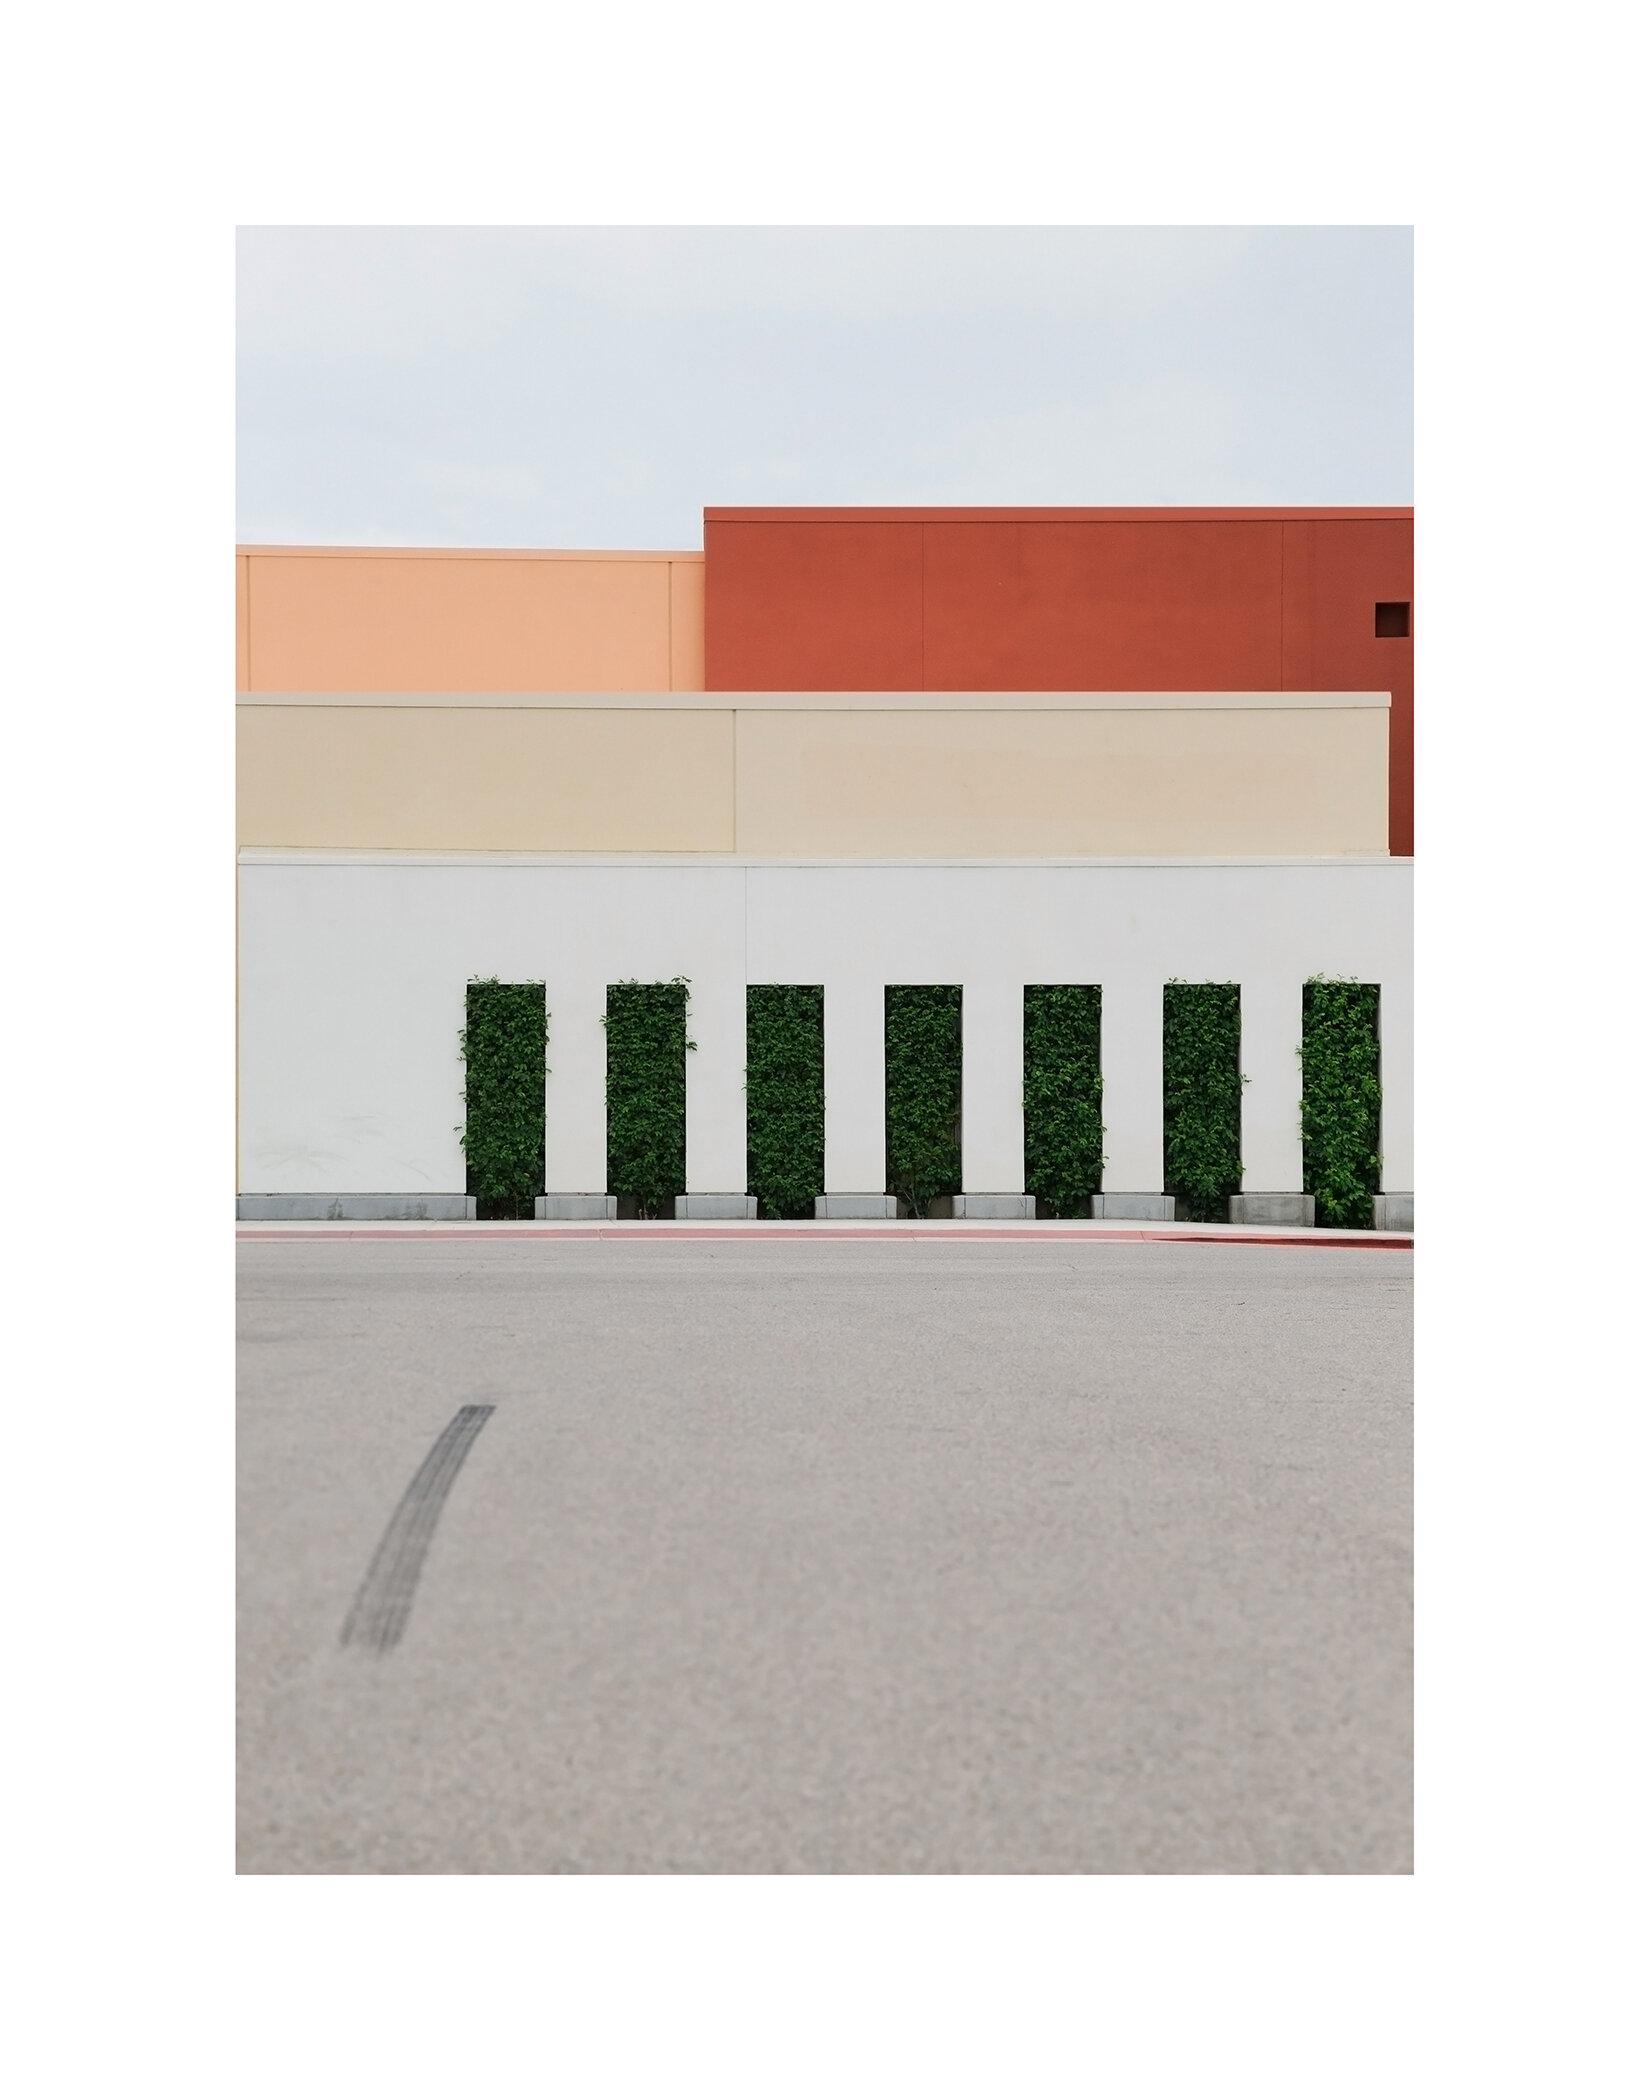 Solo Show, Contemporary Landscape/A Newer Topographic #4, CA - Rachelle Mendez